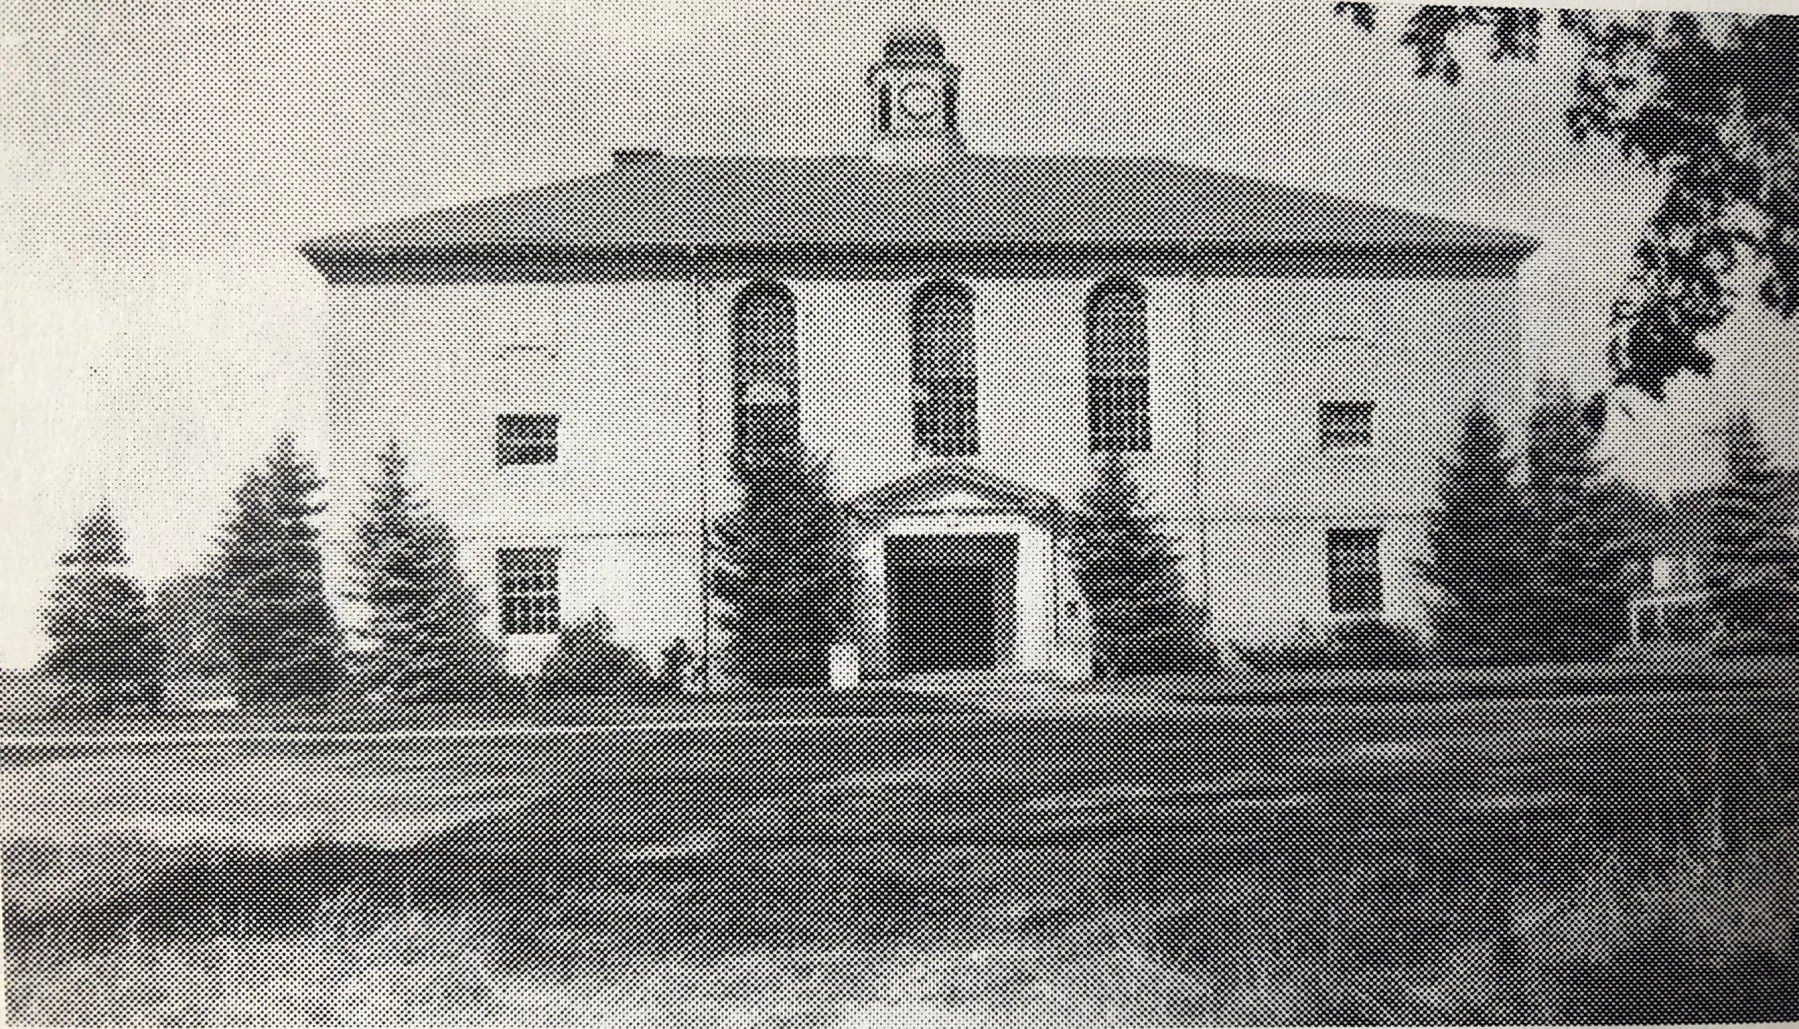 Town Hall on Center Street, 1915-1969